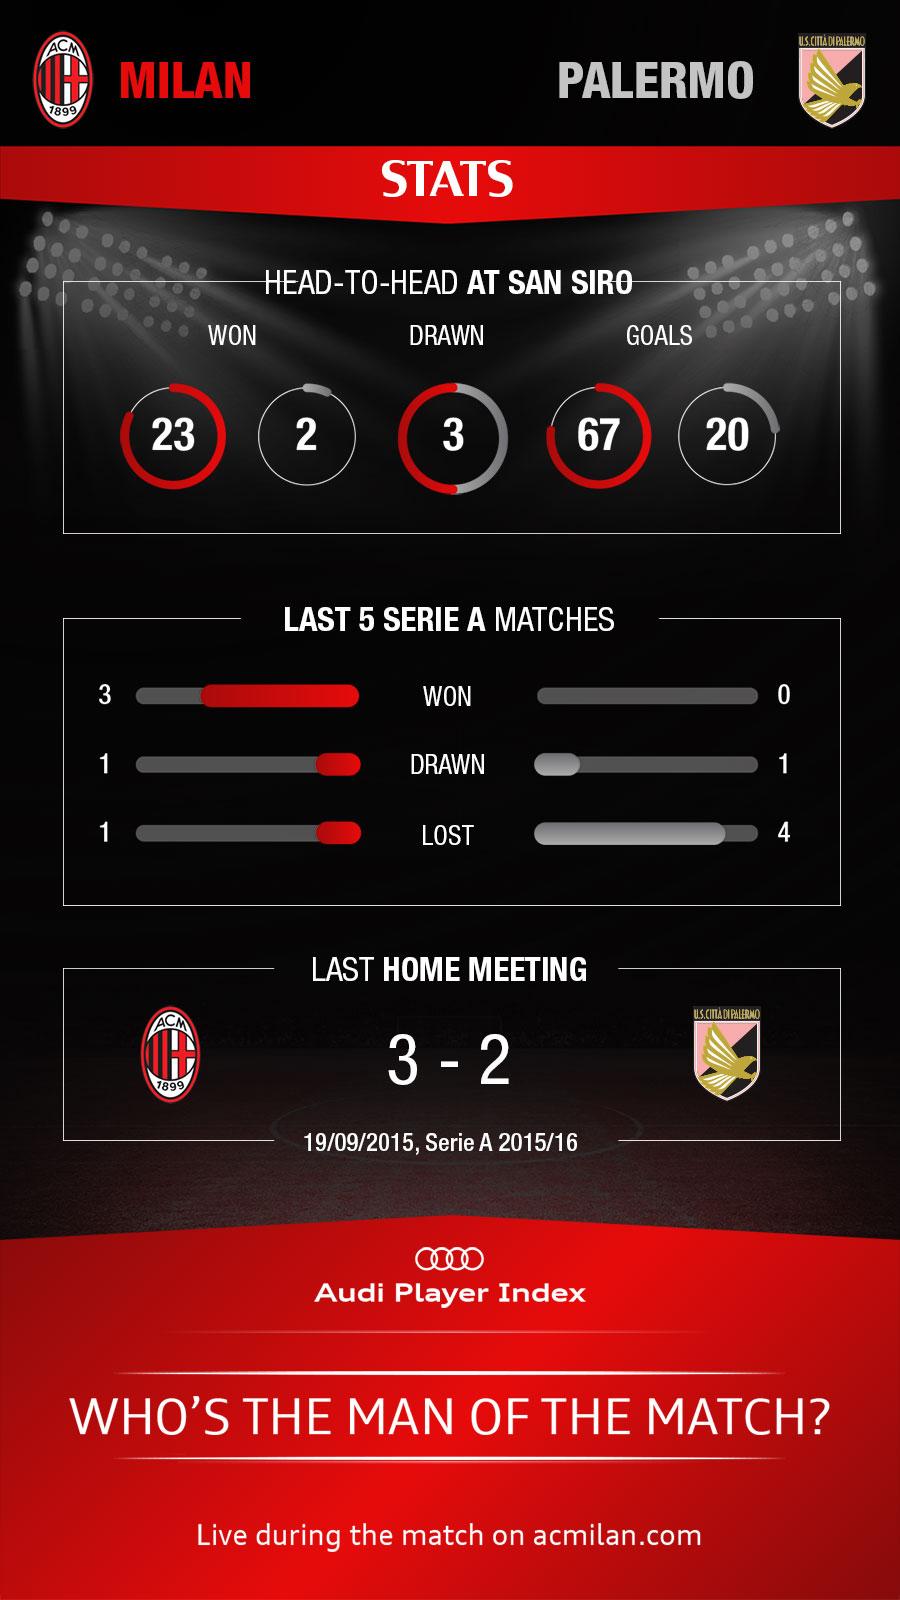 Infografica_Stats_MilanPalermoEN_Vert.jpg